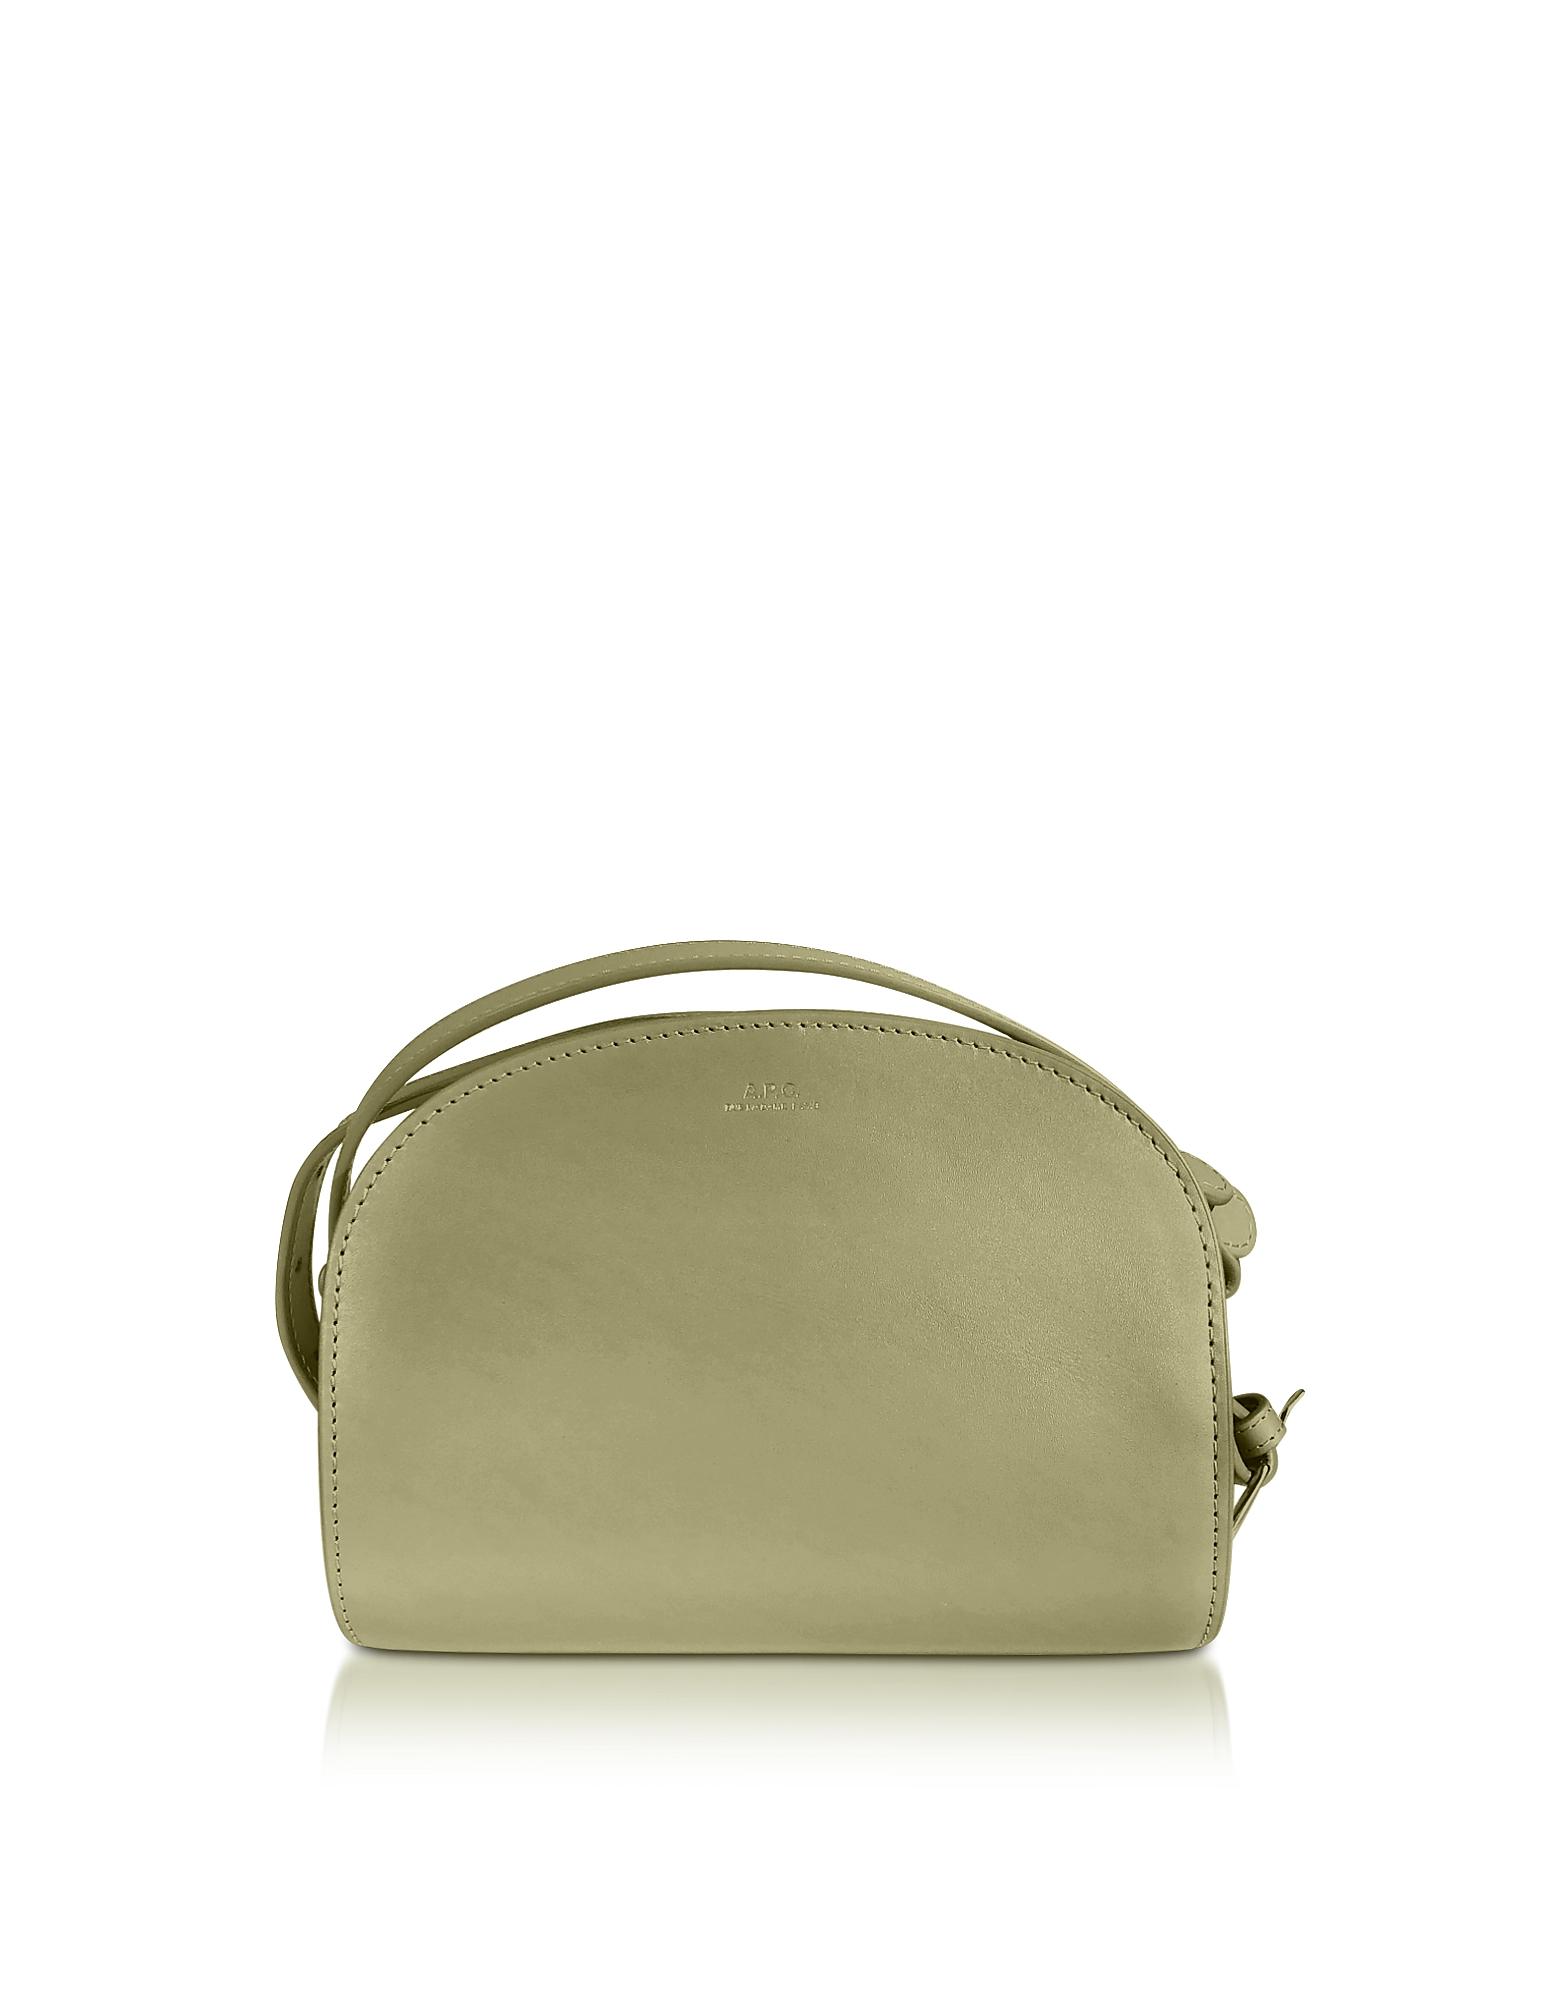 A.P.C. Designer Handbags, Green Leather Mini Demi-Lune Crossbody Bag